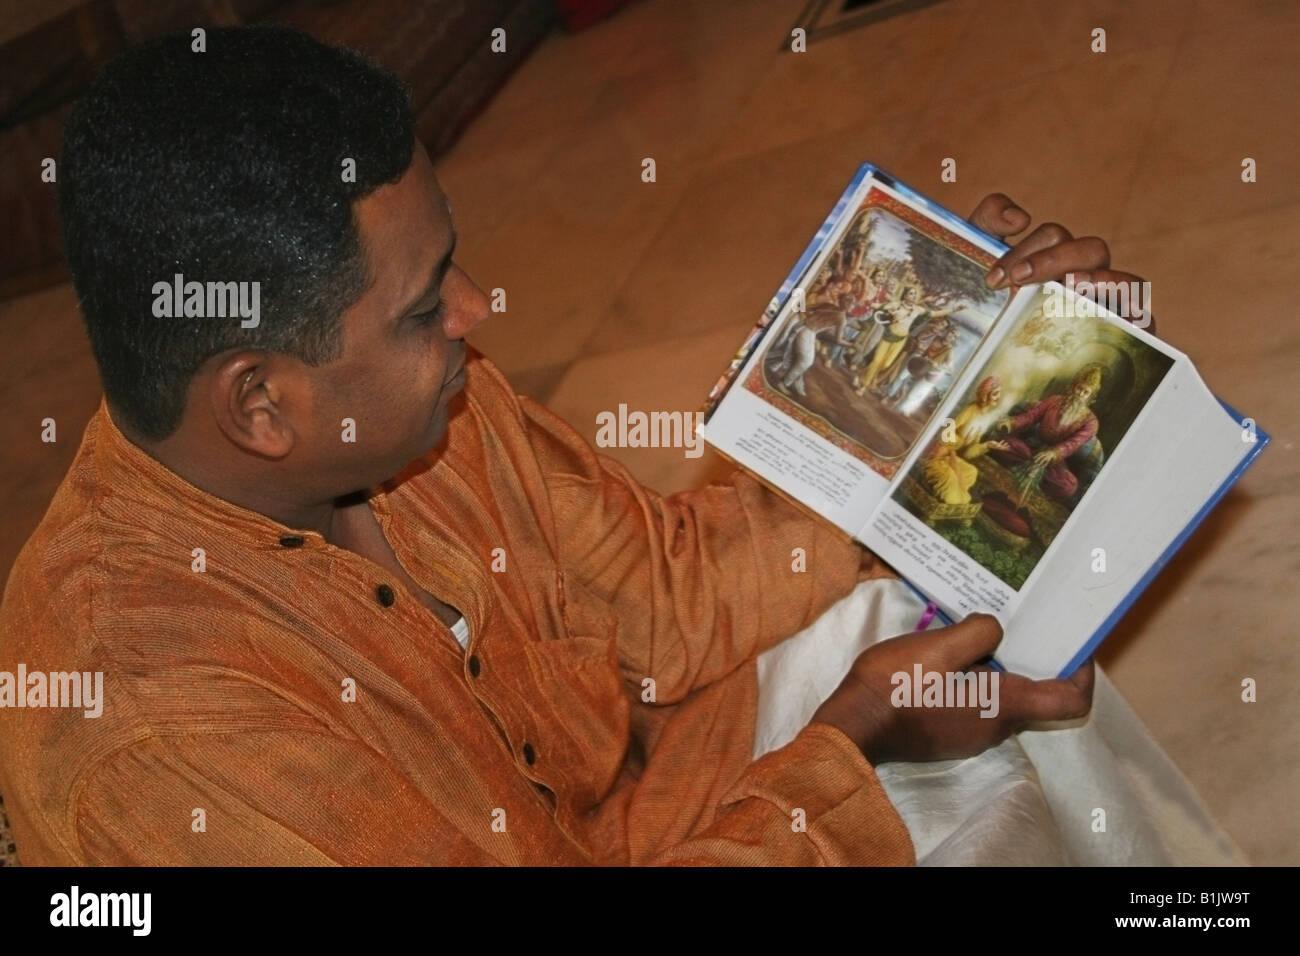 Hindu Man reading The Bhagavad Gita , A Hindu Holy book , India - Stock Image